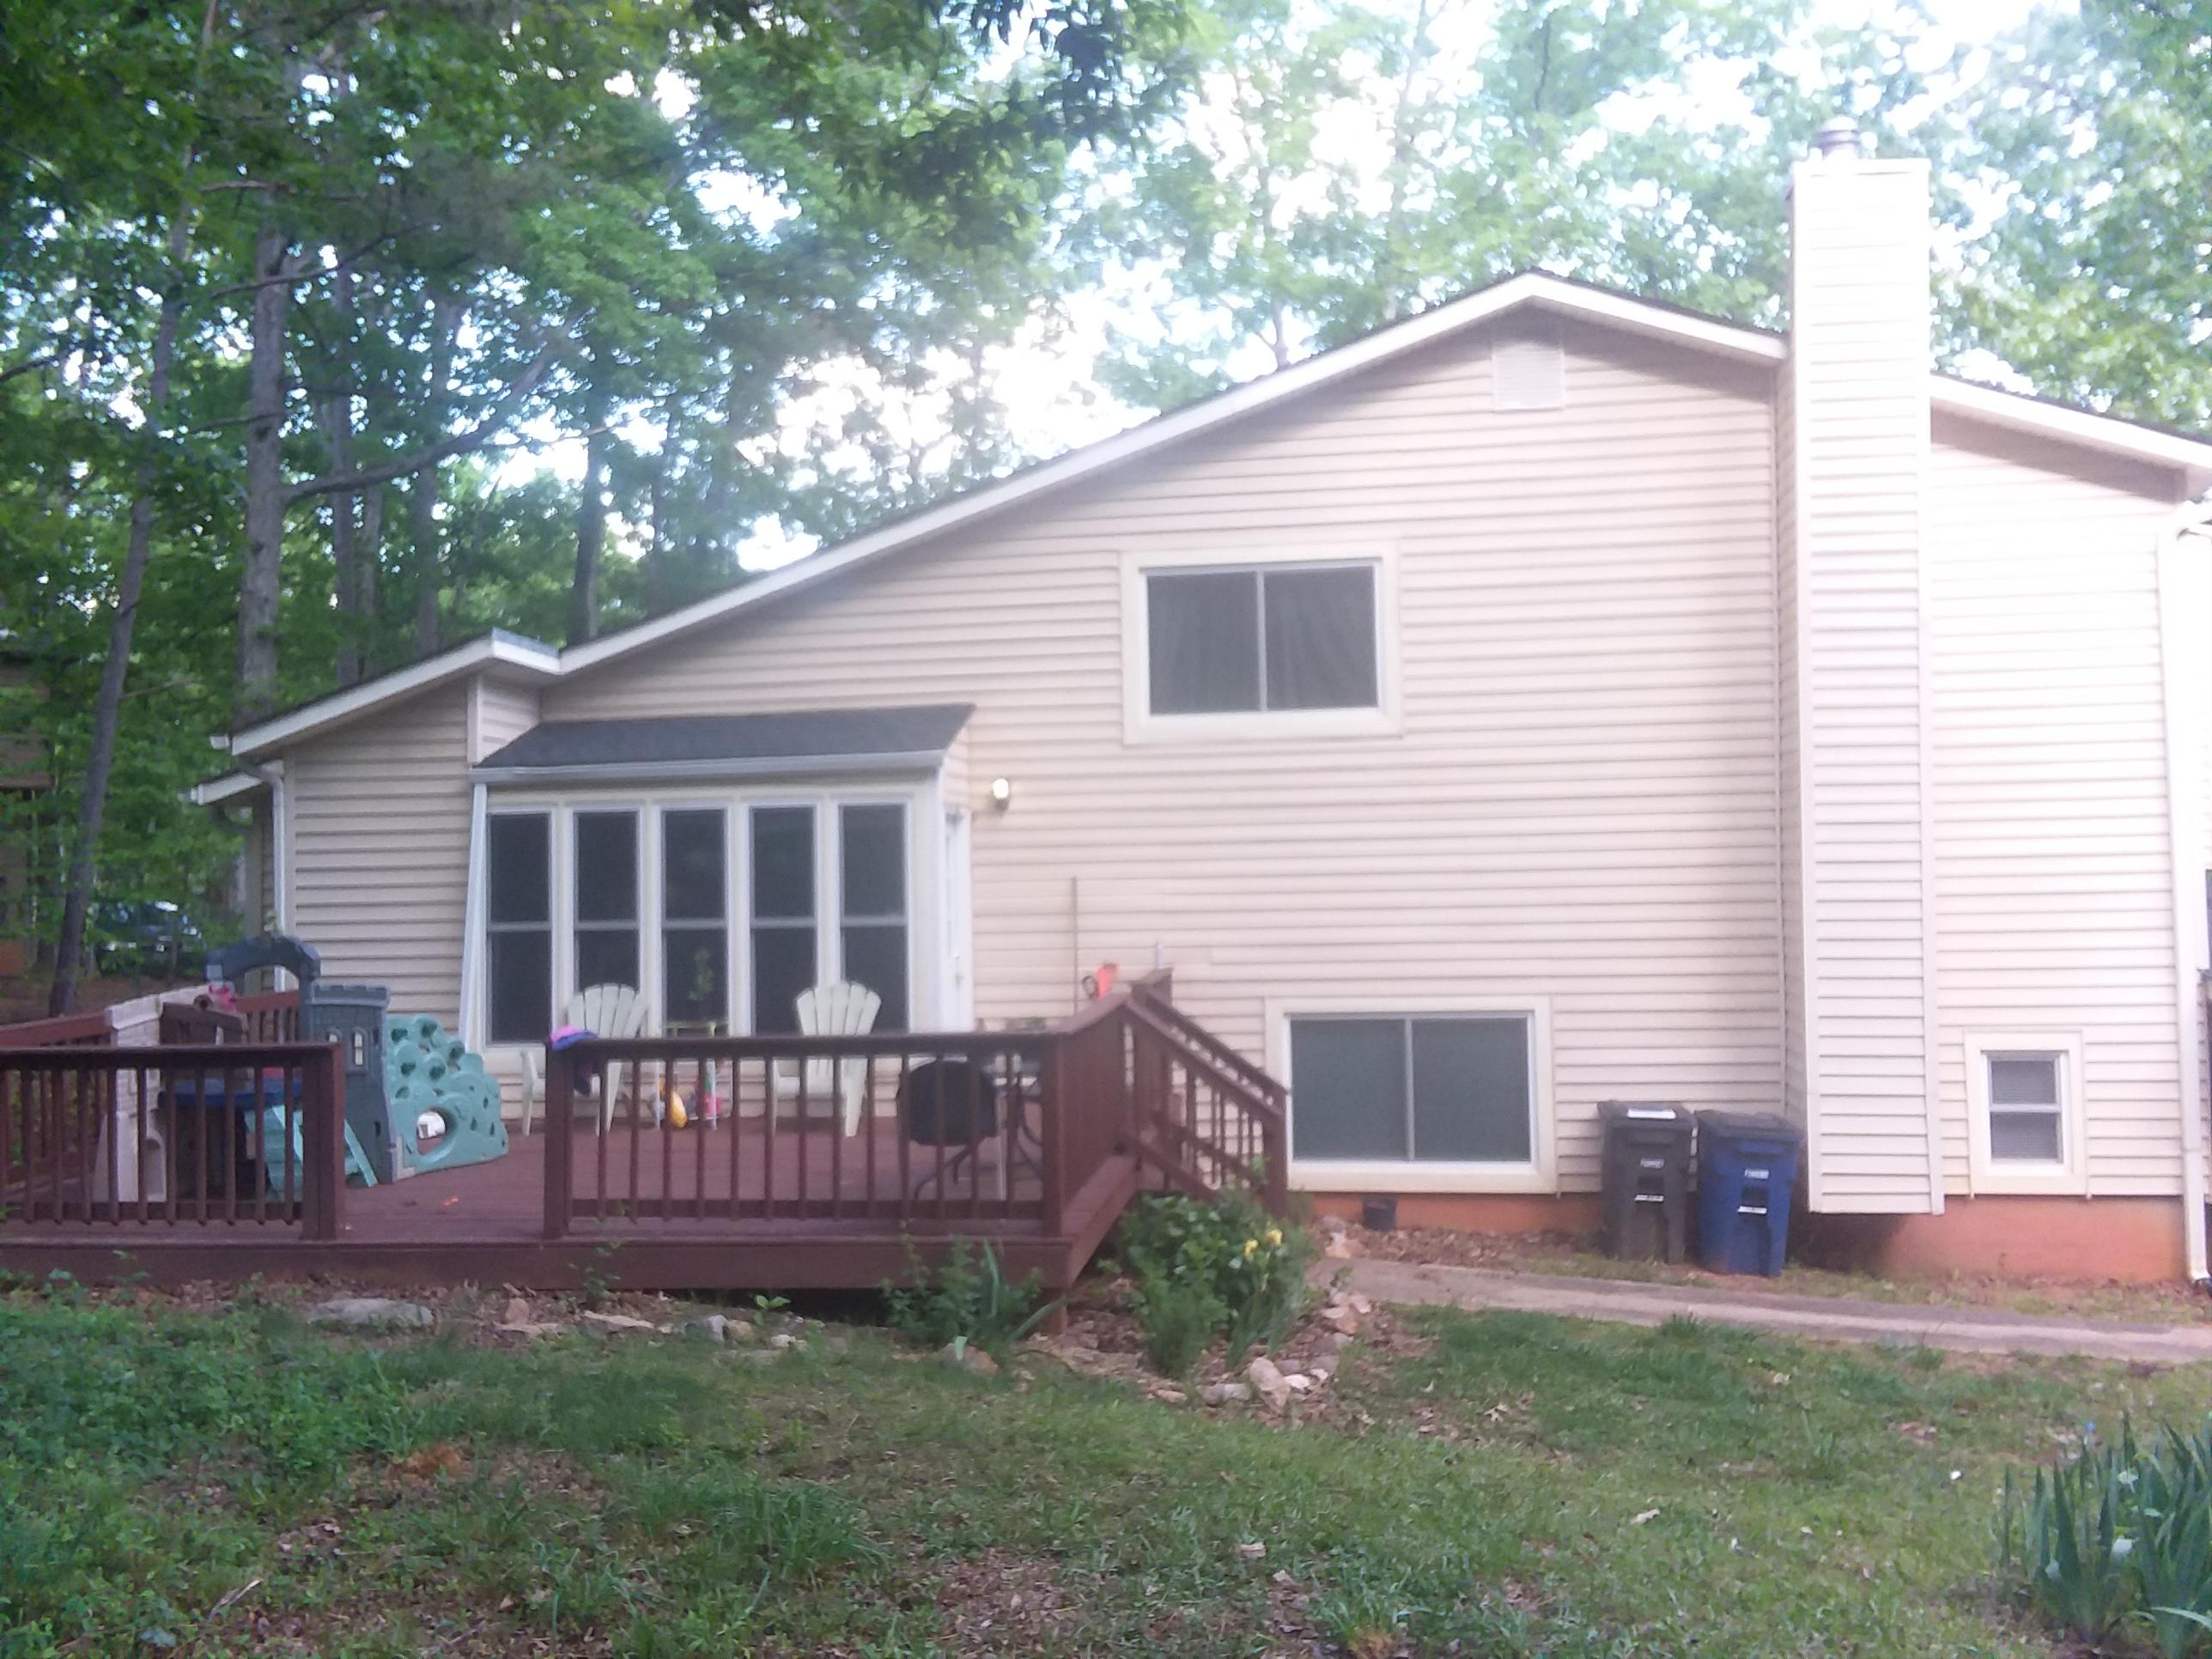 Photo of 8604 Dogwood Ct, Douglasville, GA, 30135